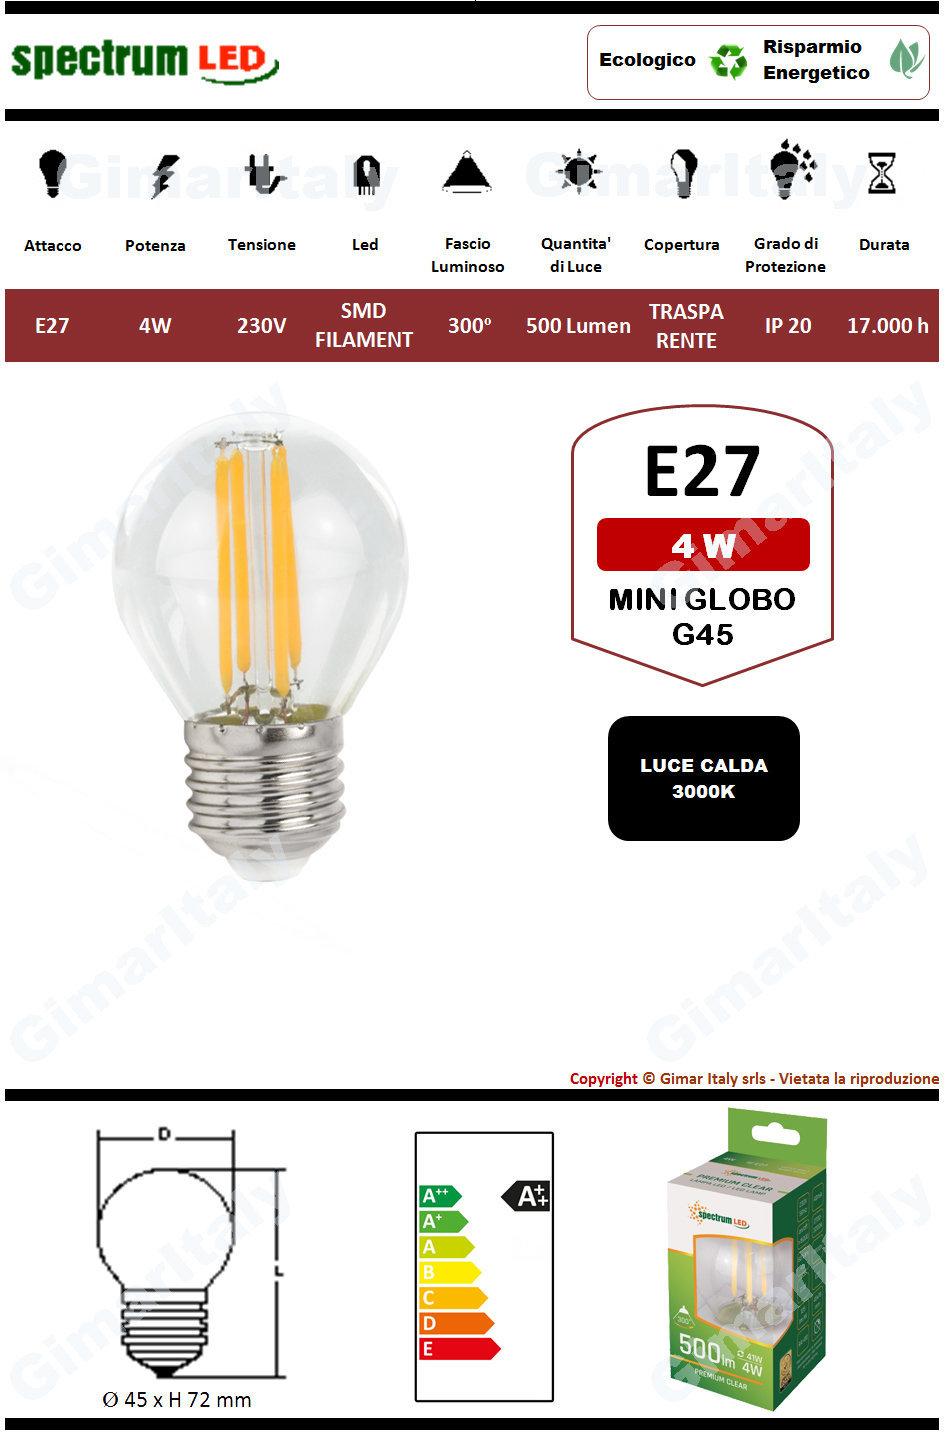 Lampadina Led E27 4W Miniglobo G45 Filamento Spectrum